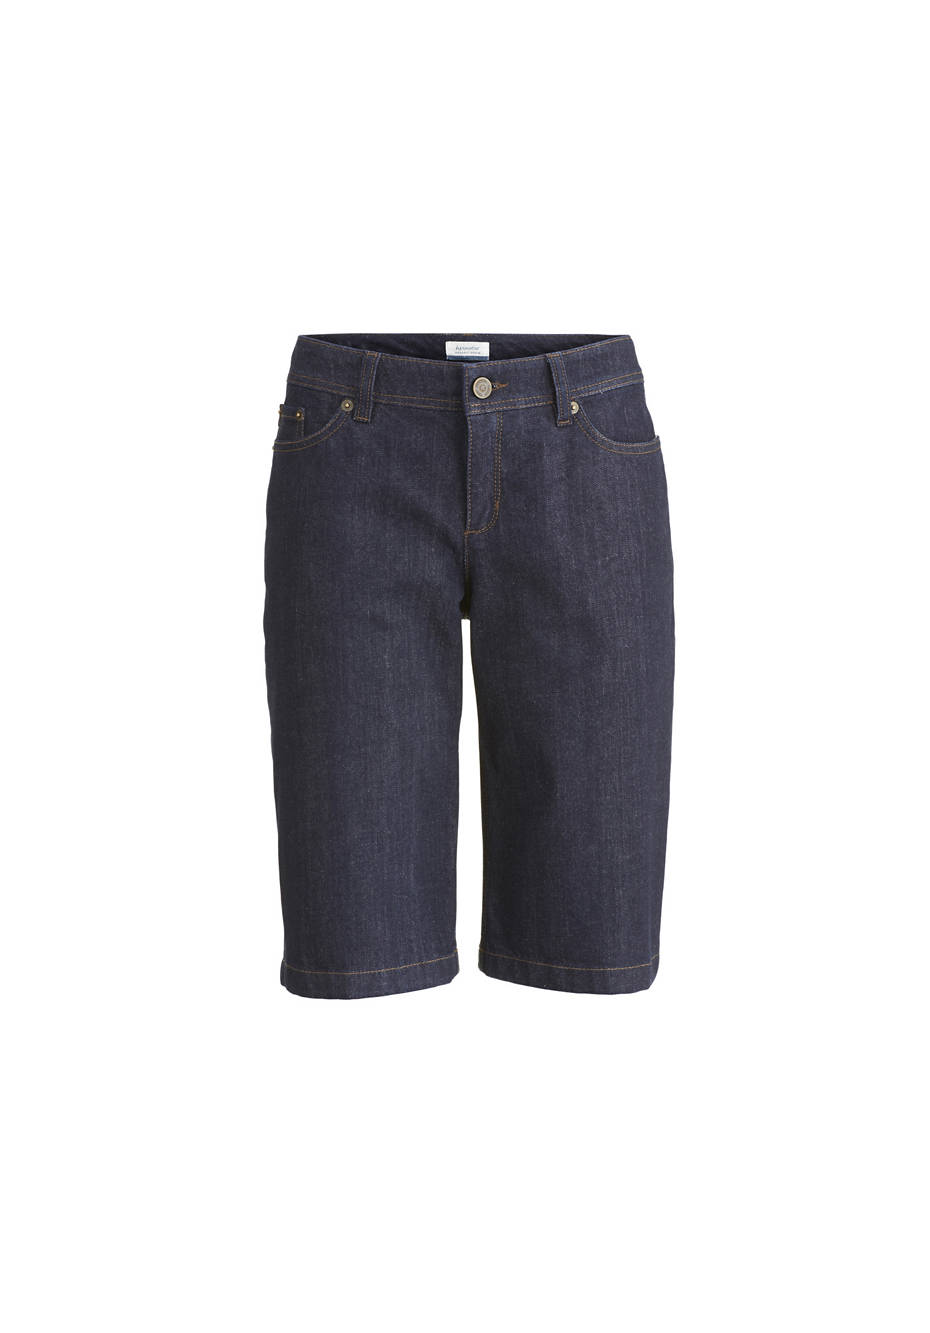 Jeans Bermudas made of organic cotton